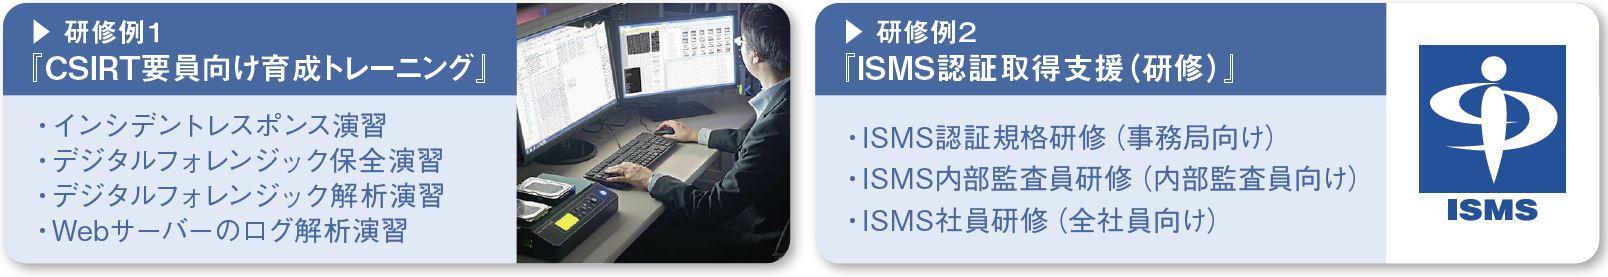 研修例1「CSIRT要員向け育成トレーニング」、研修例2「ISMS認証取得支援(研修)」